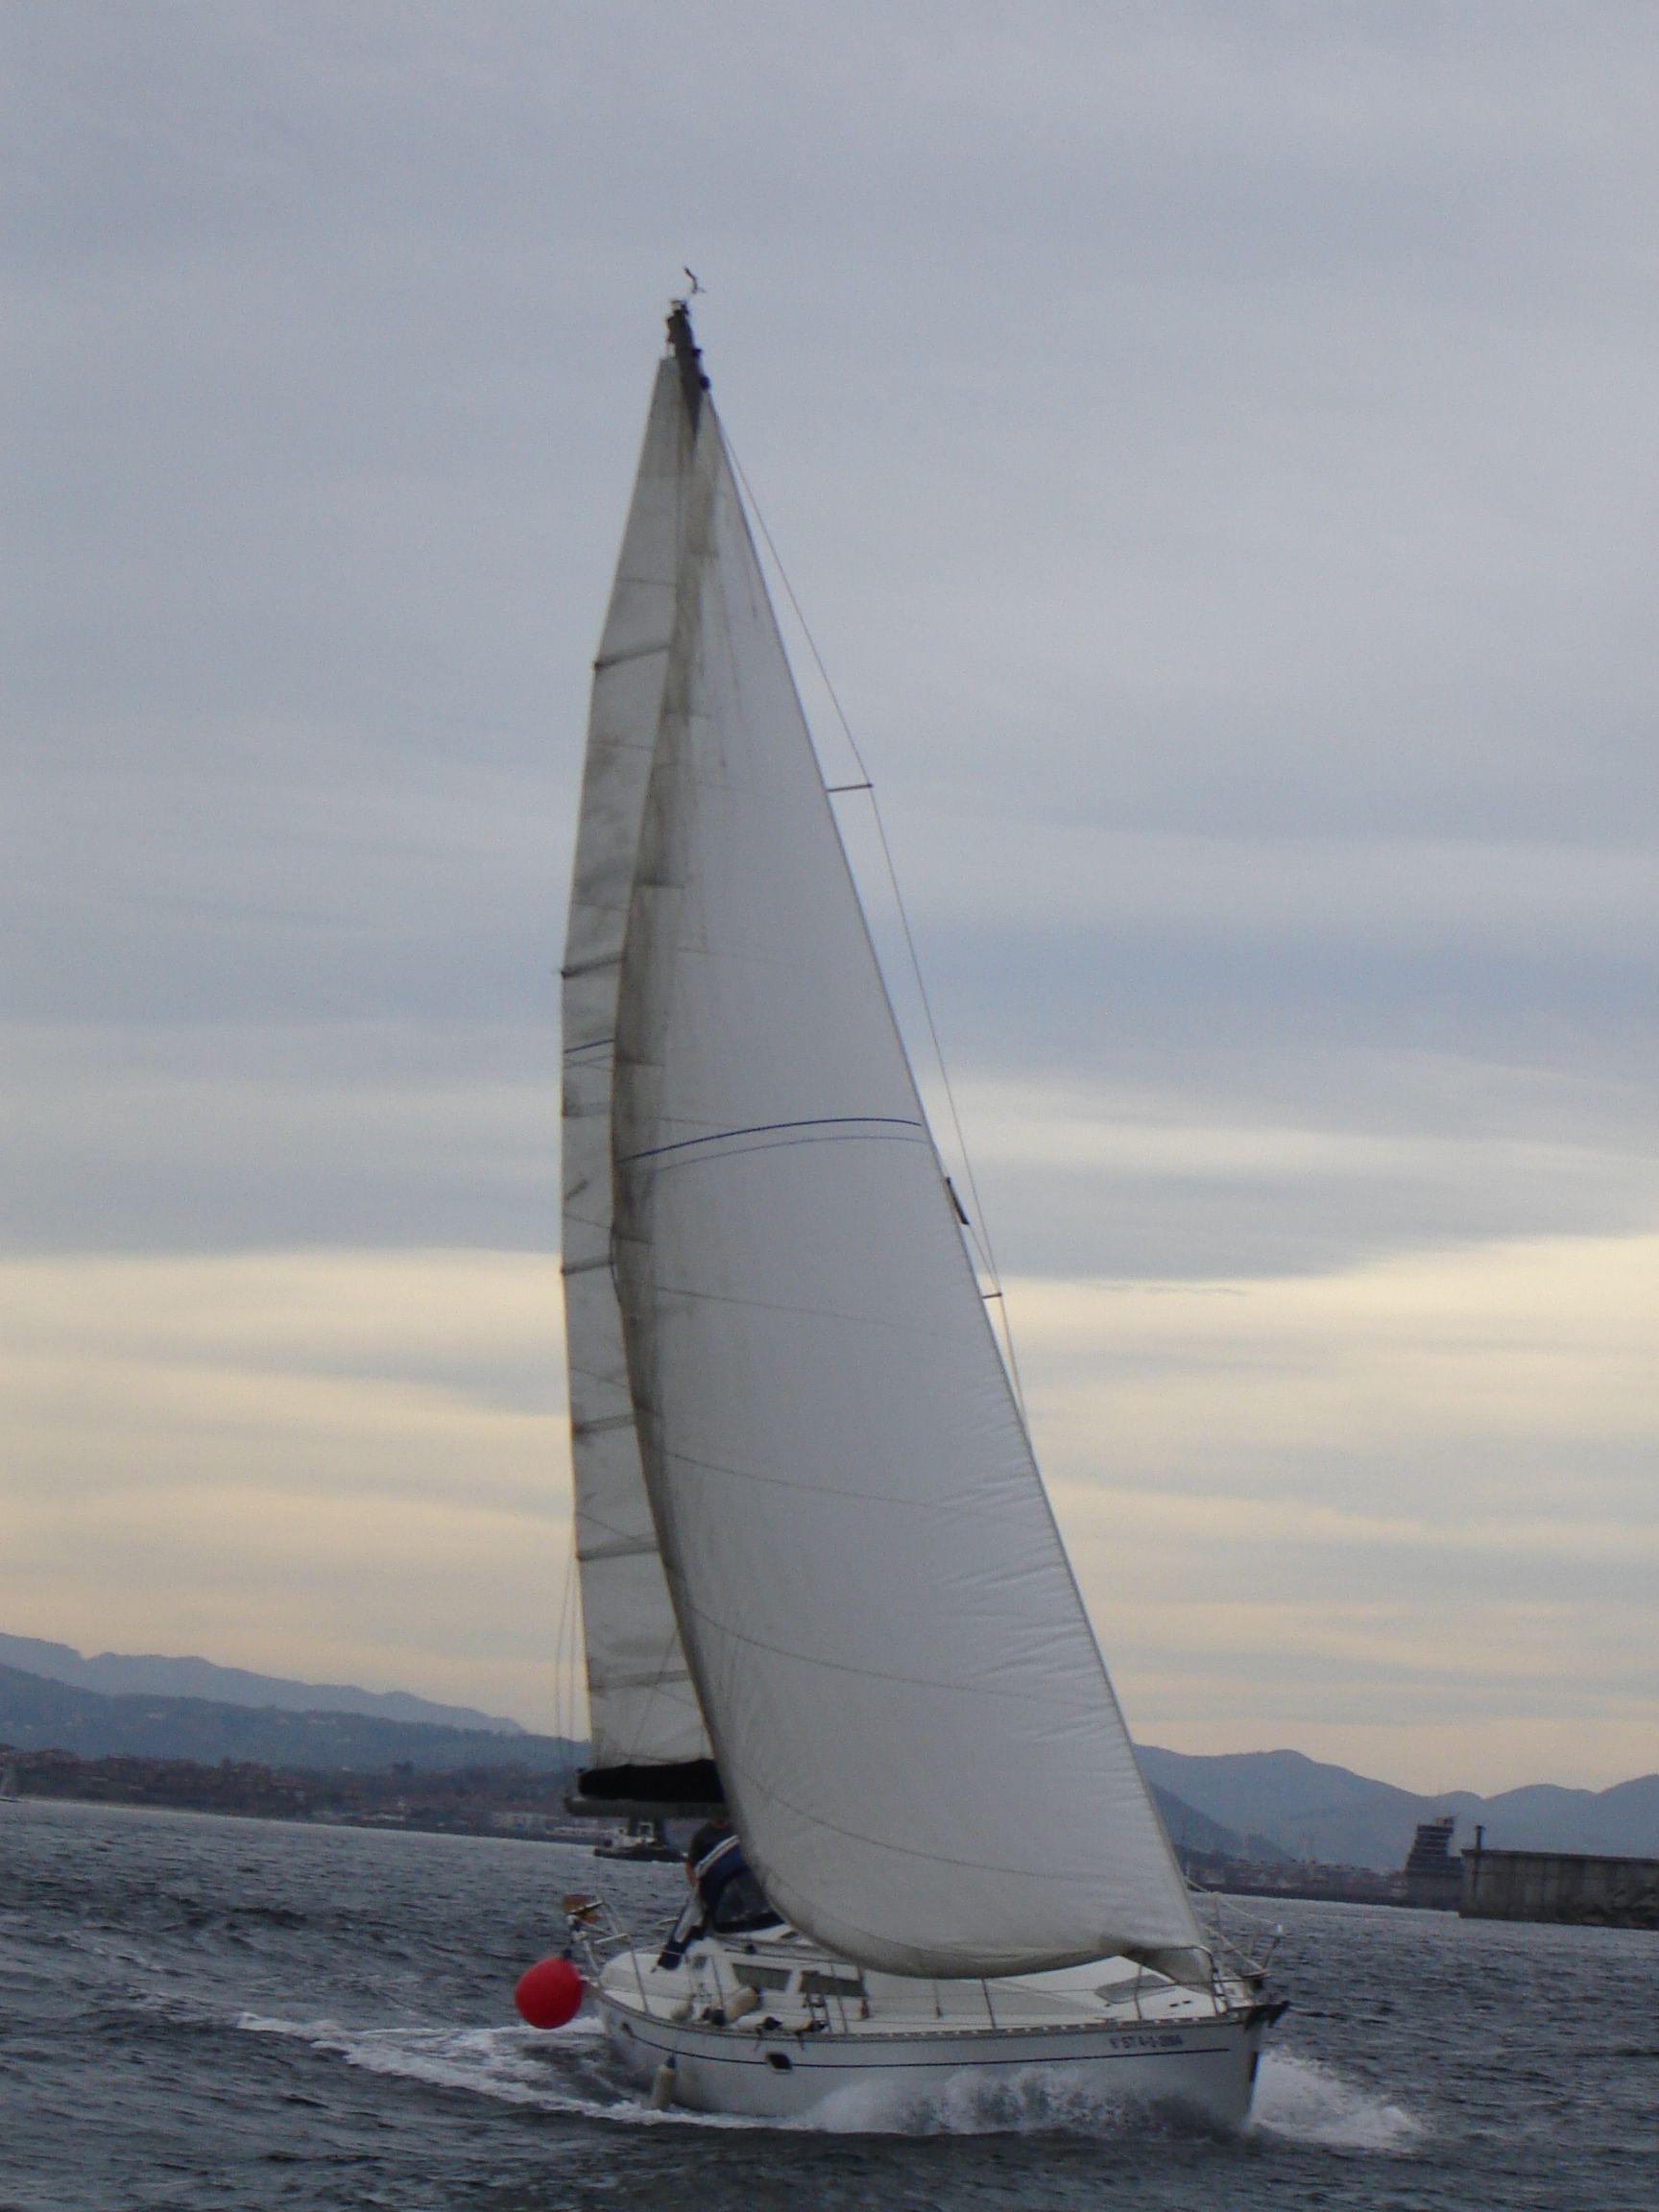 Navegando a vela por las costas cantabricas. Animals, Birds